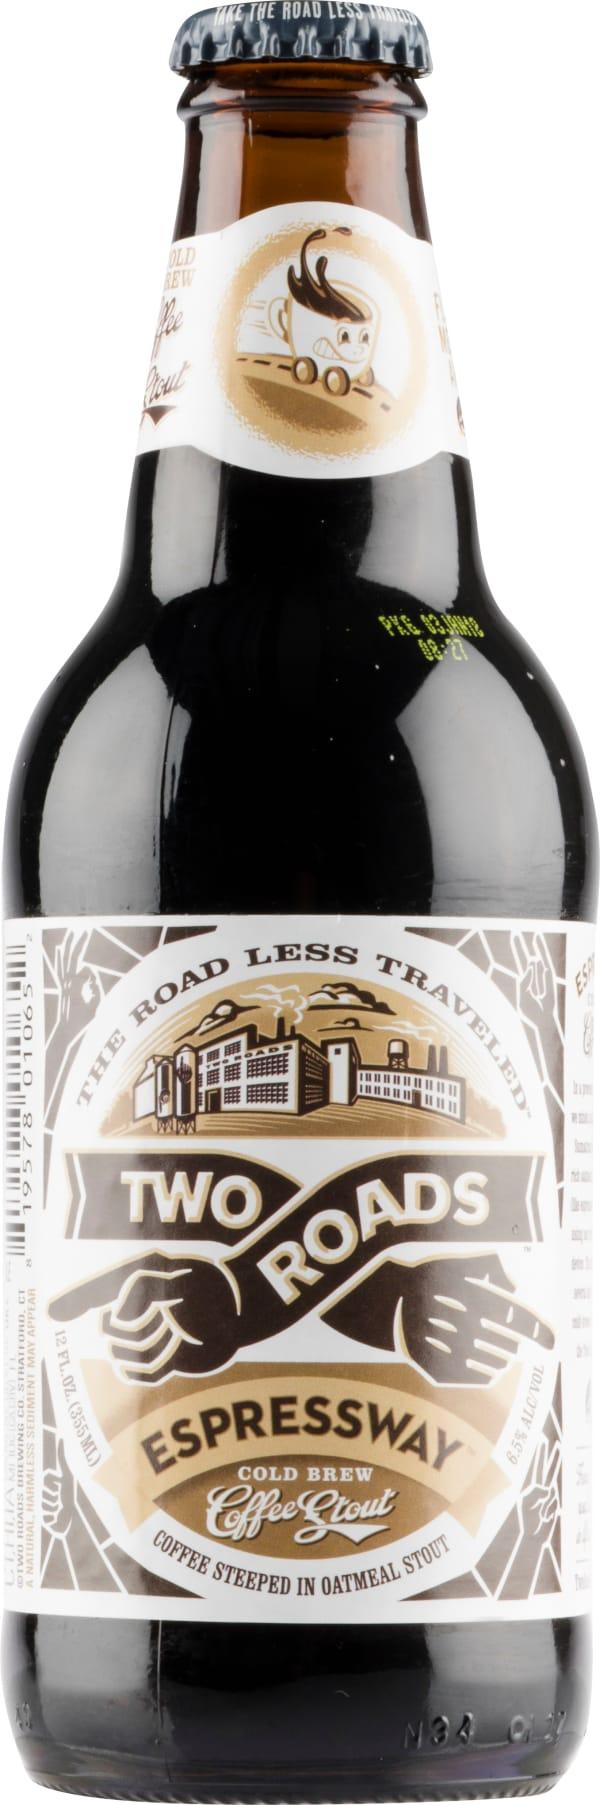 Two Roads Espressway Cold Brew Coffee Stout